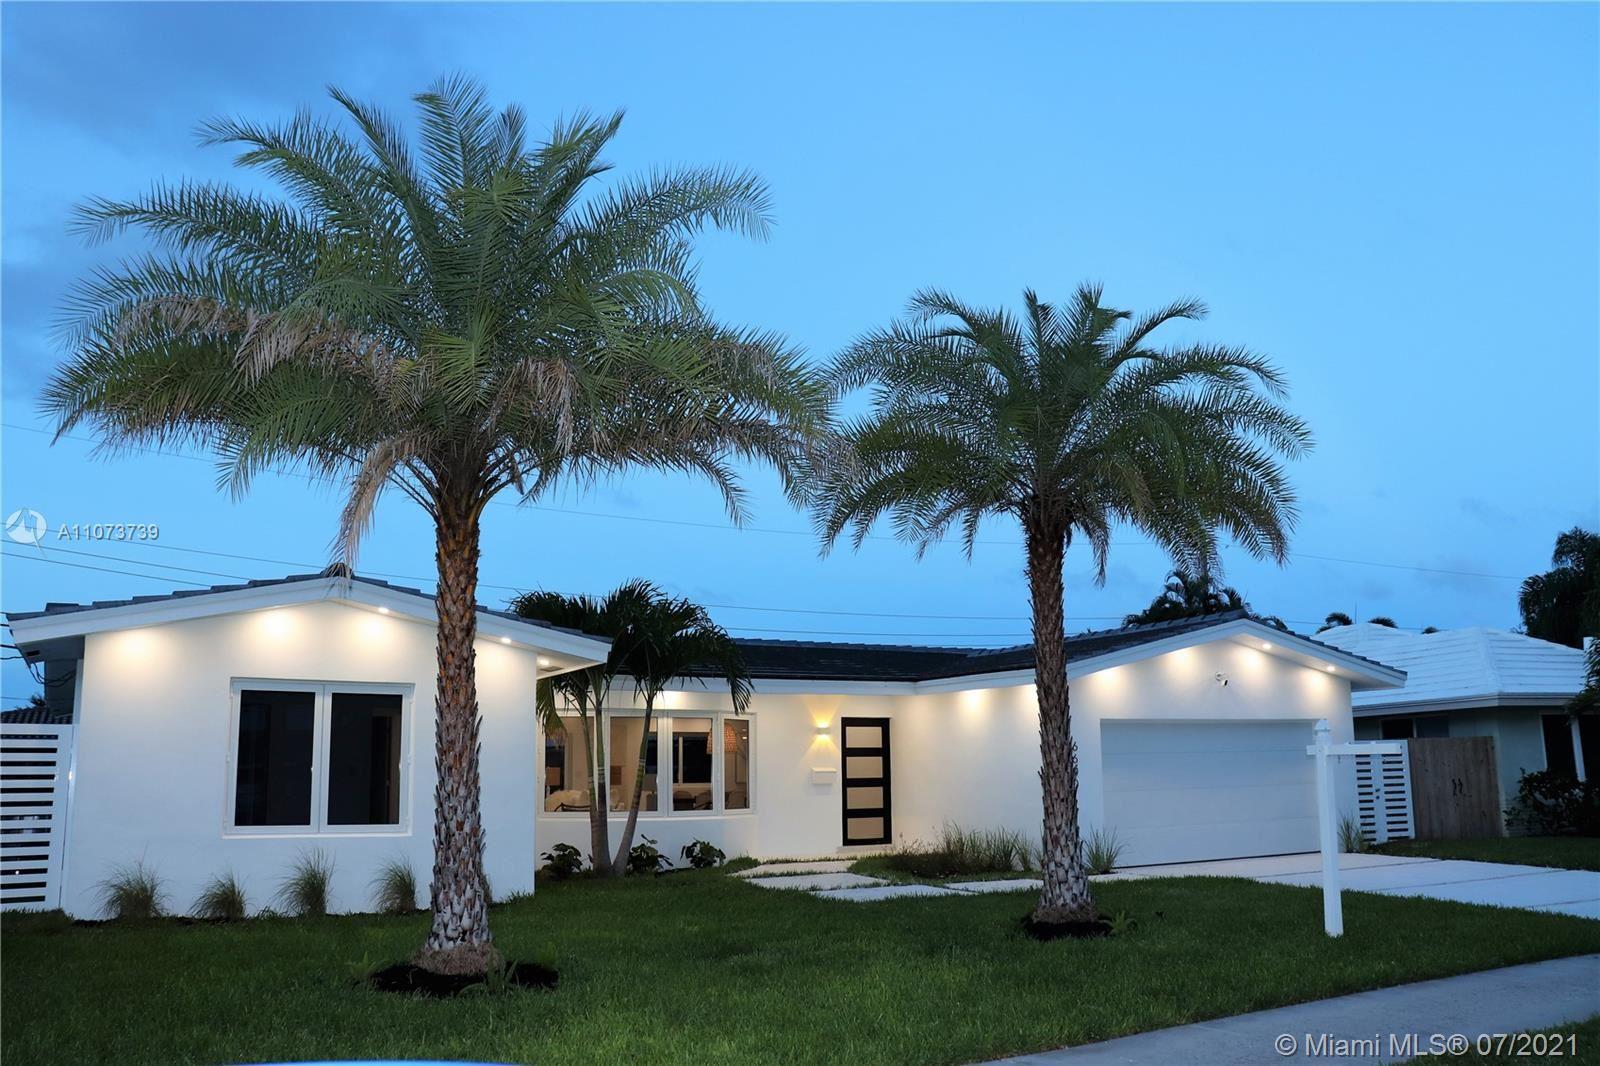 Photo of 6600 NE 21st Dr, Fort Lauderdale, FL 33308 (MLS # A11073739)